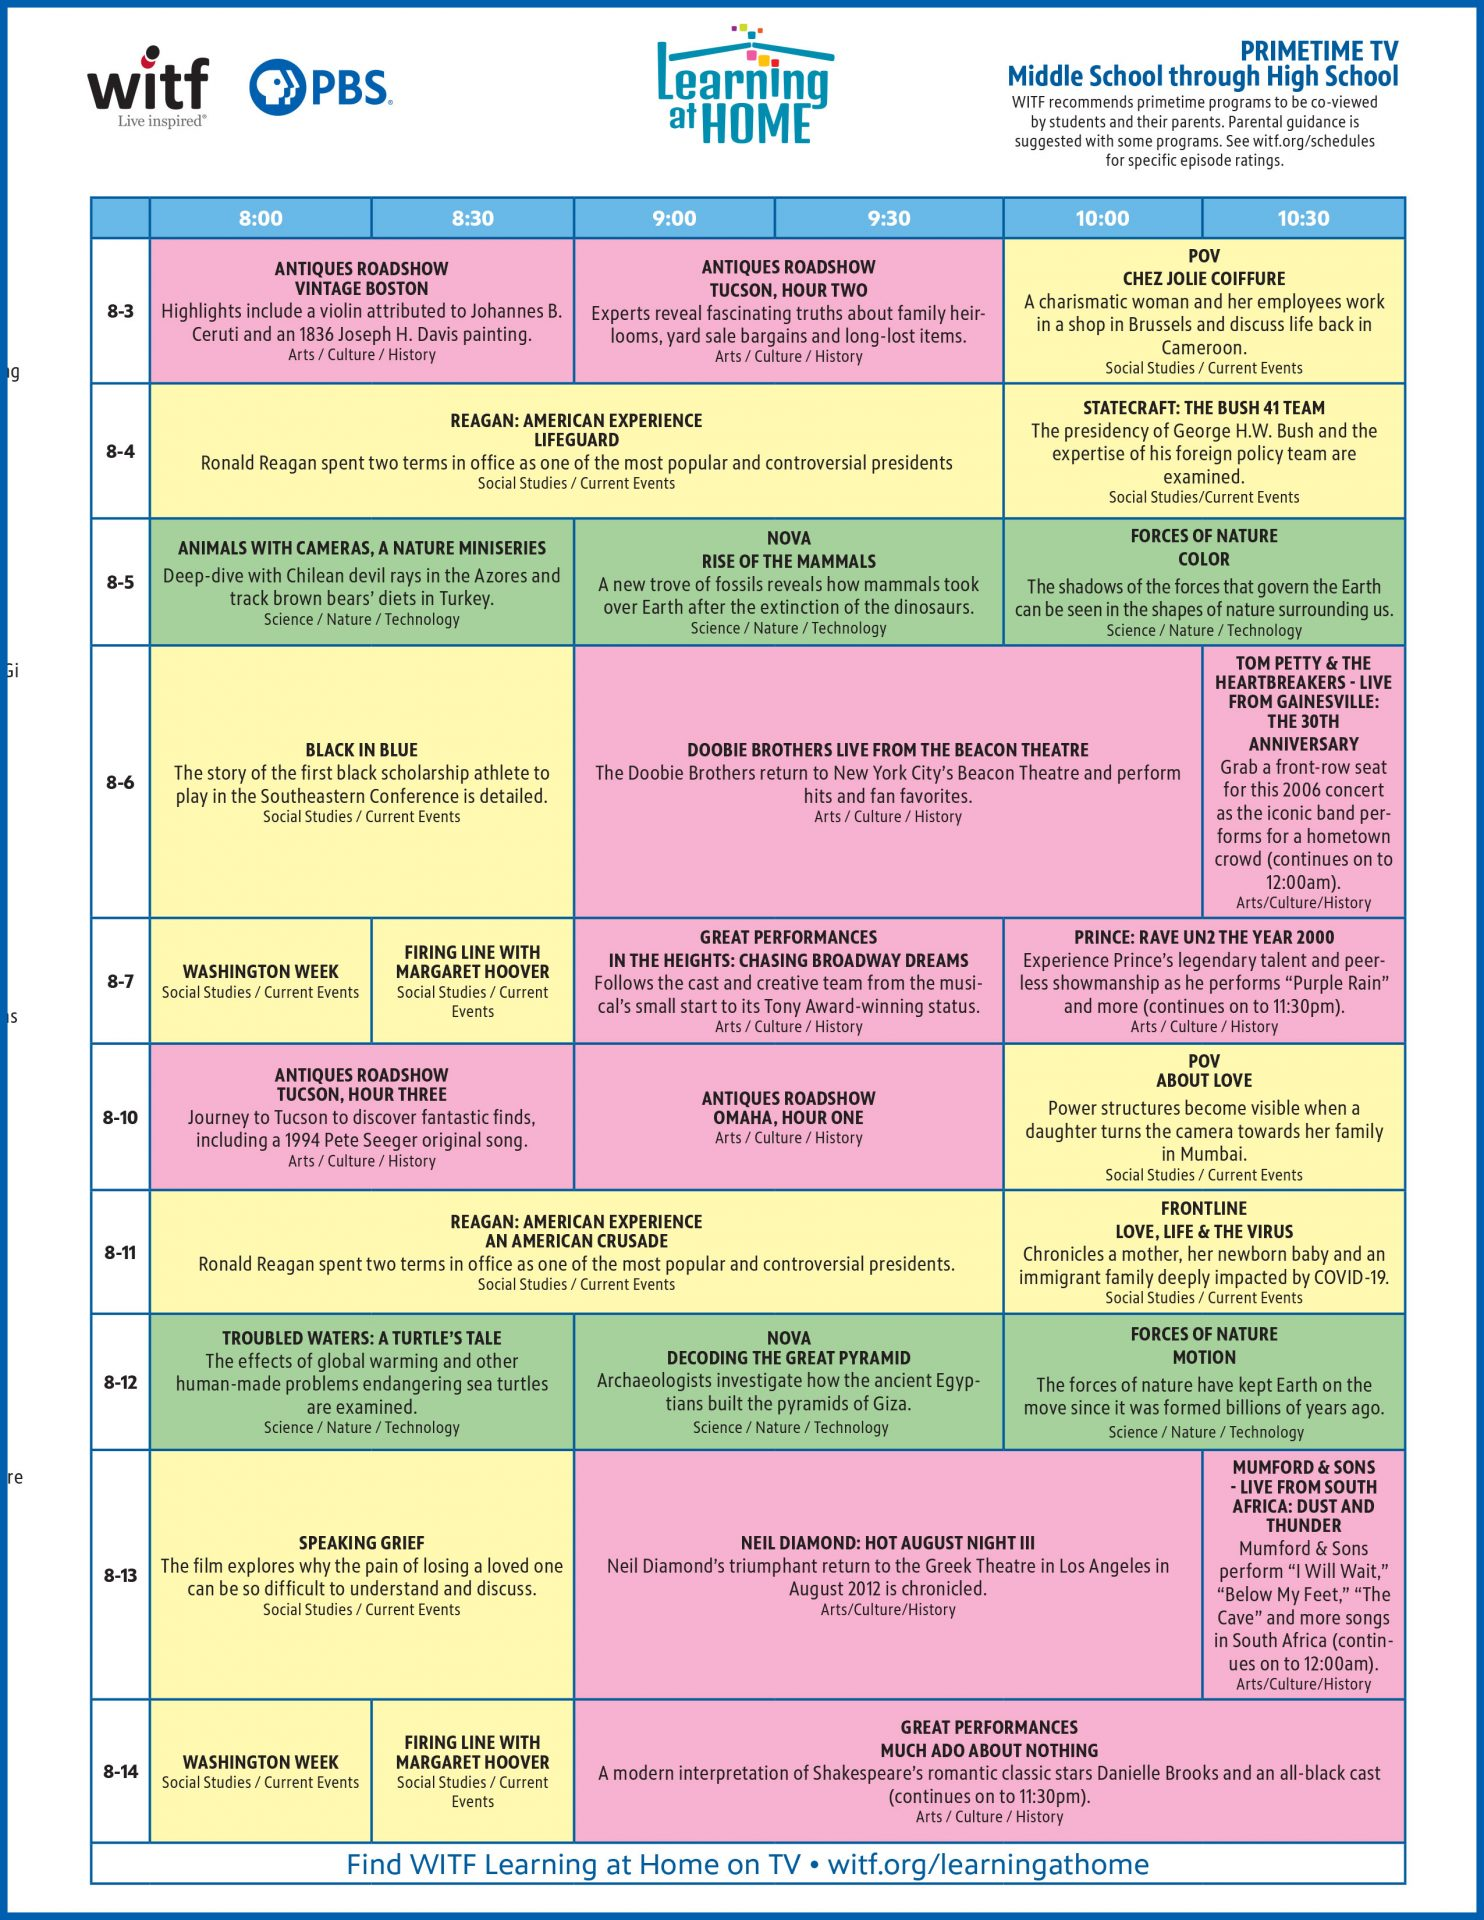 Middle School through High School Primetime Schedule